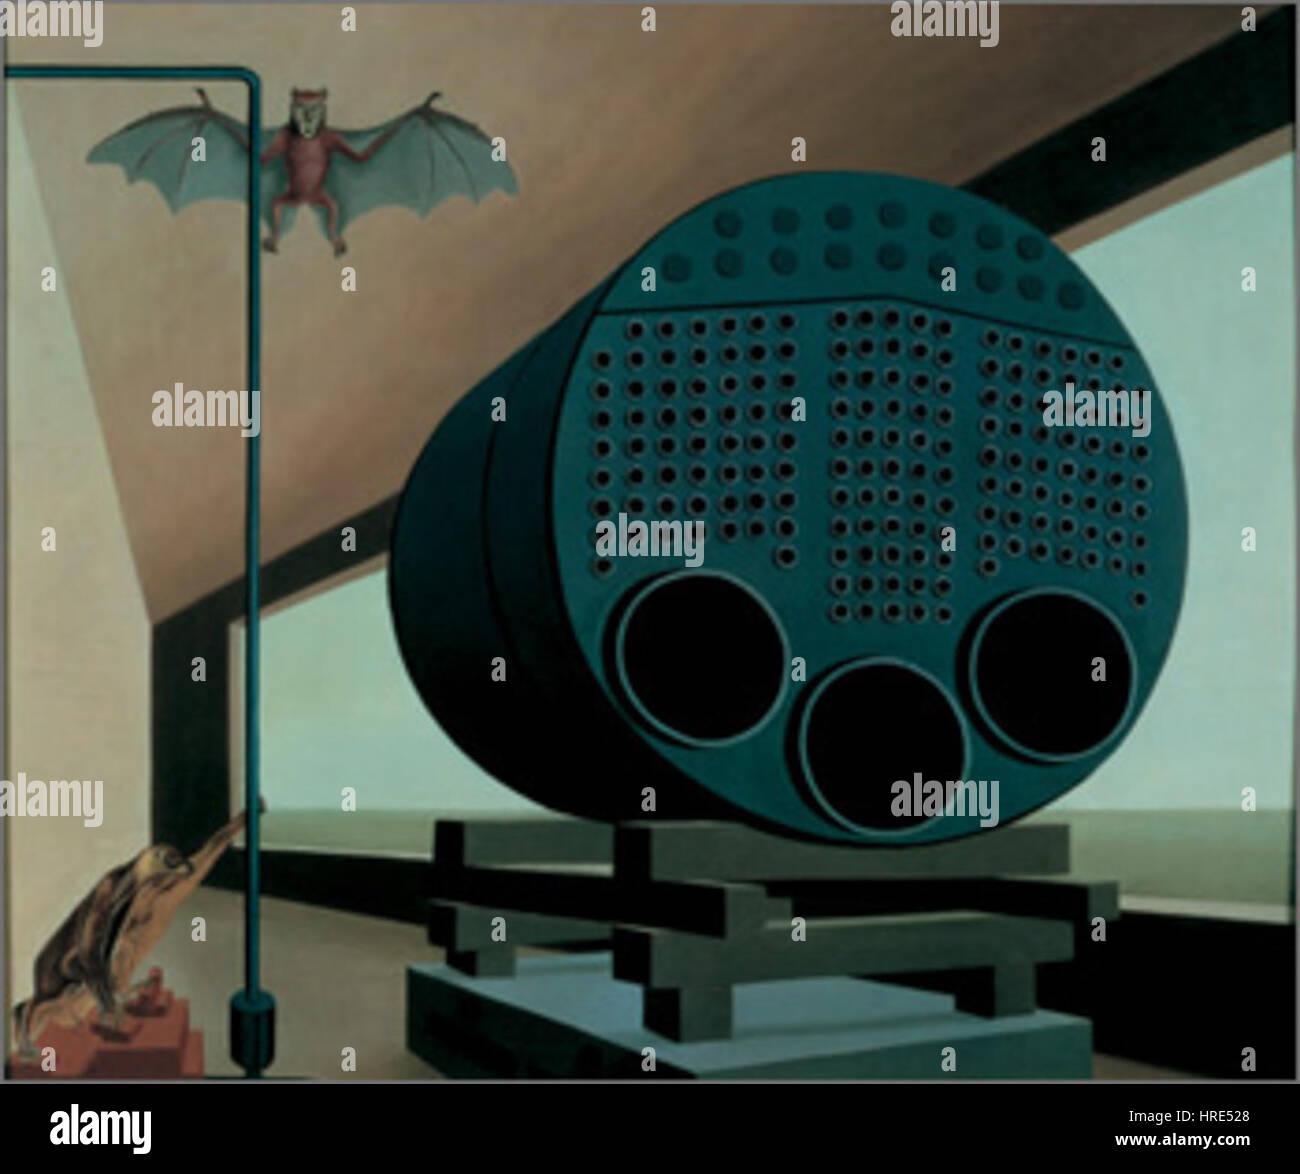 Dampfkessel Stockfotos & Dampfkessel Bilder - Alamy